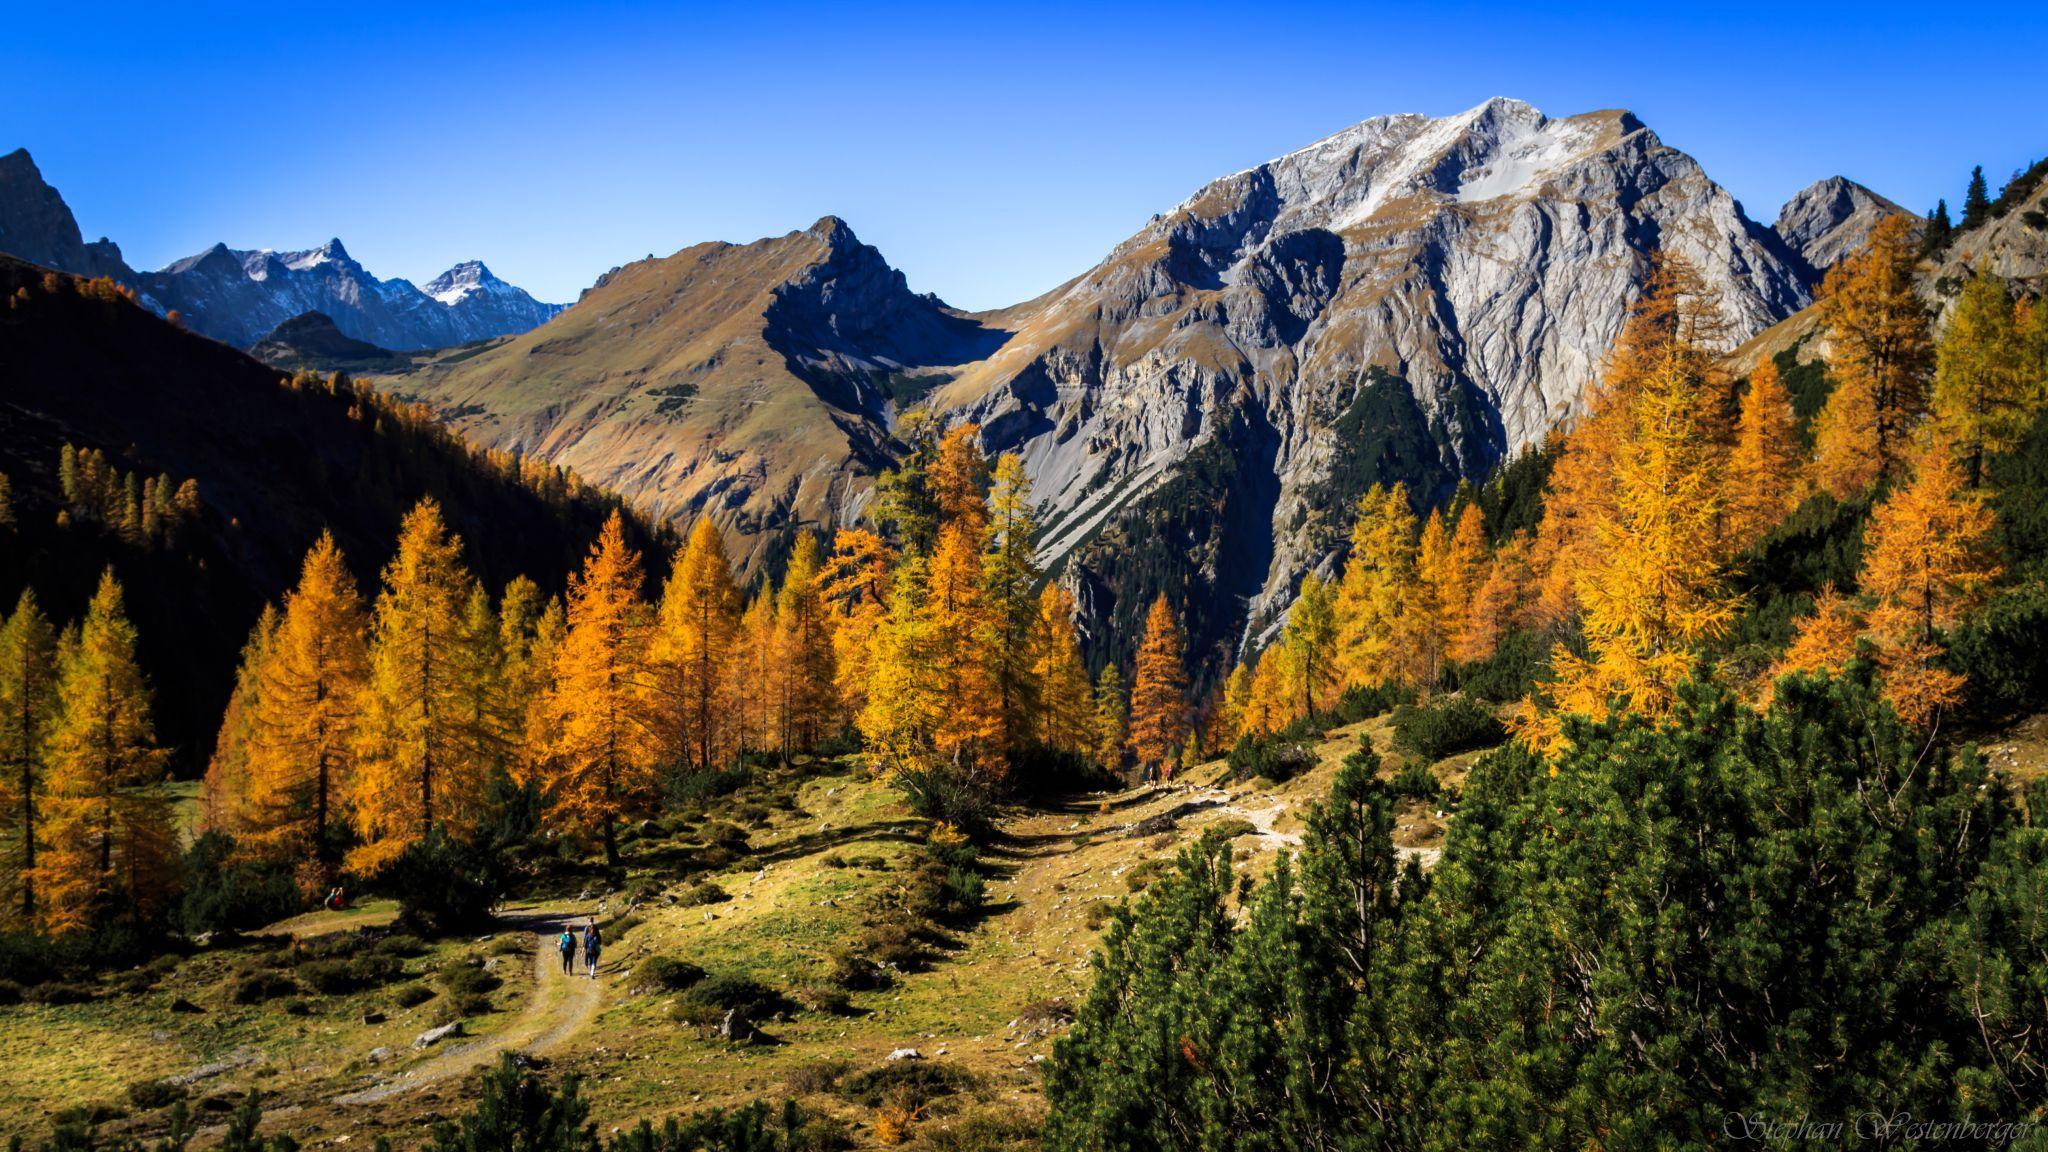 Karwendel Binsalm, Austria